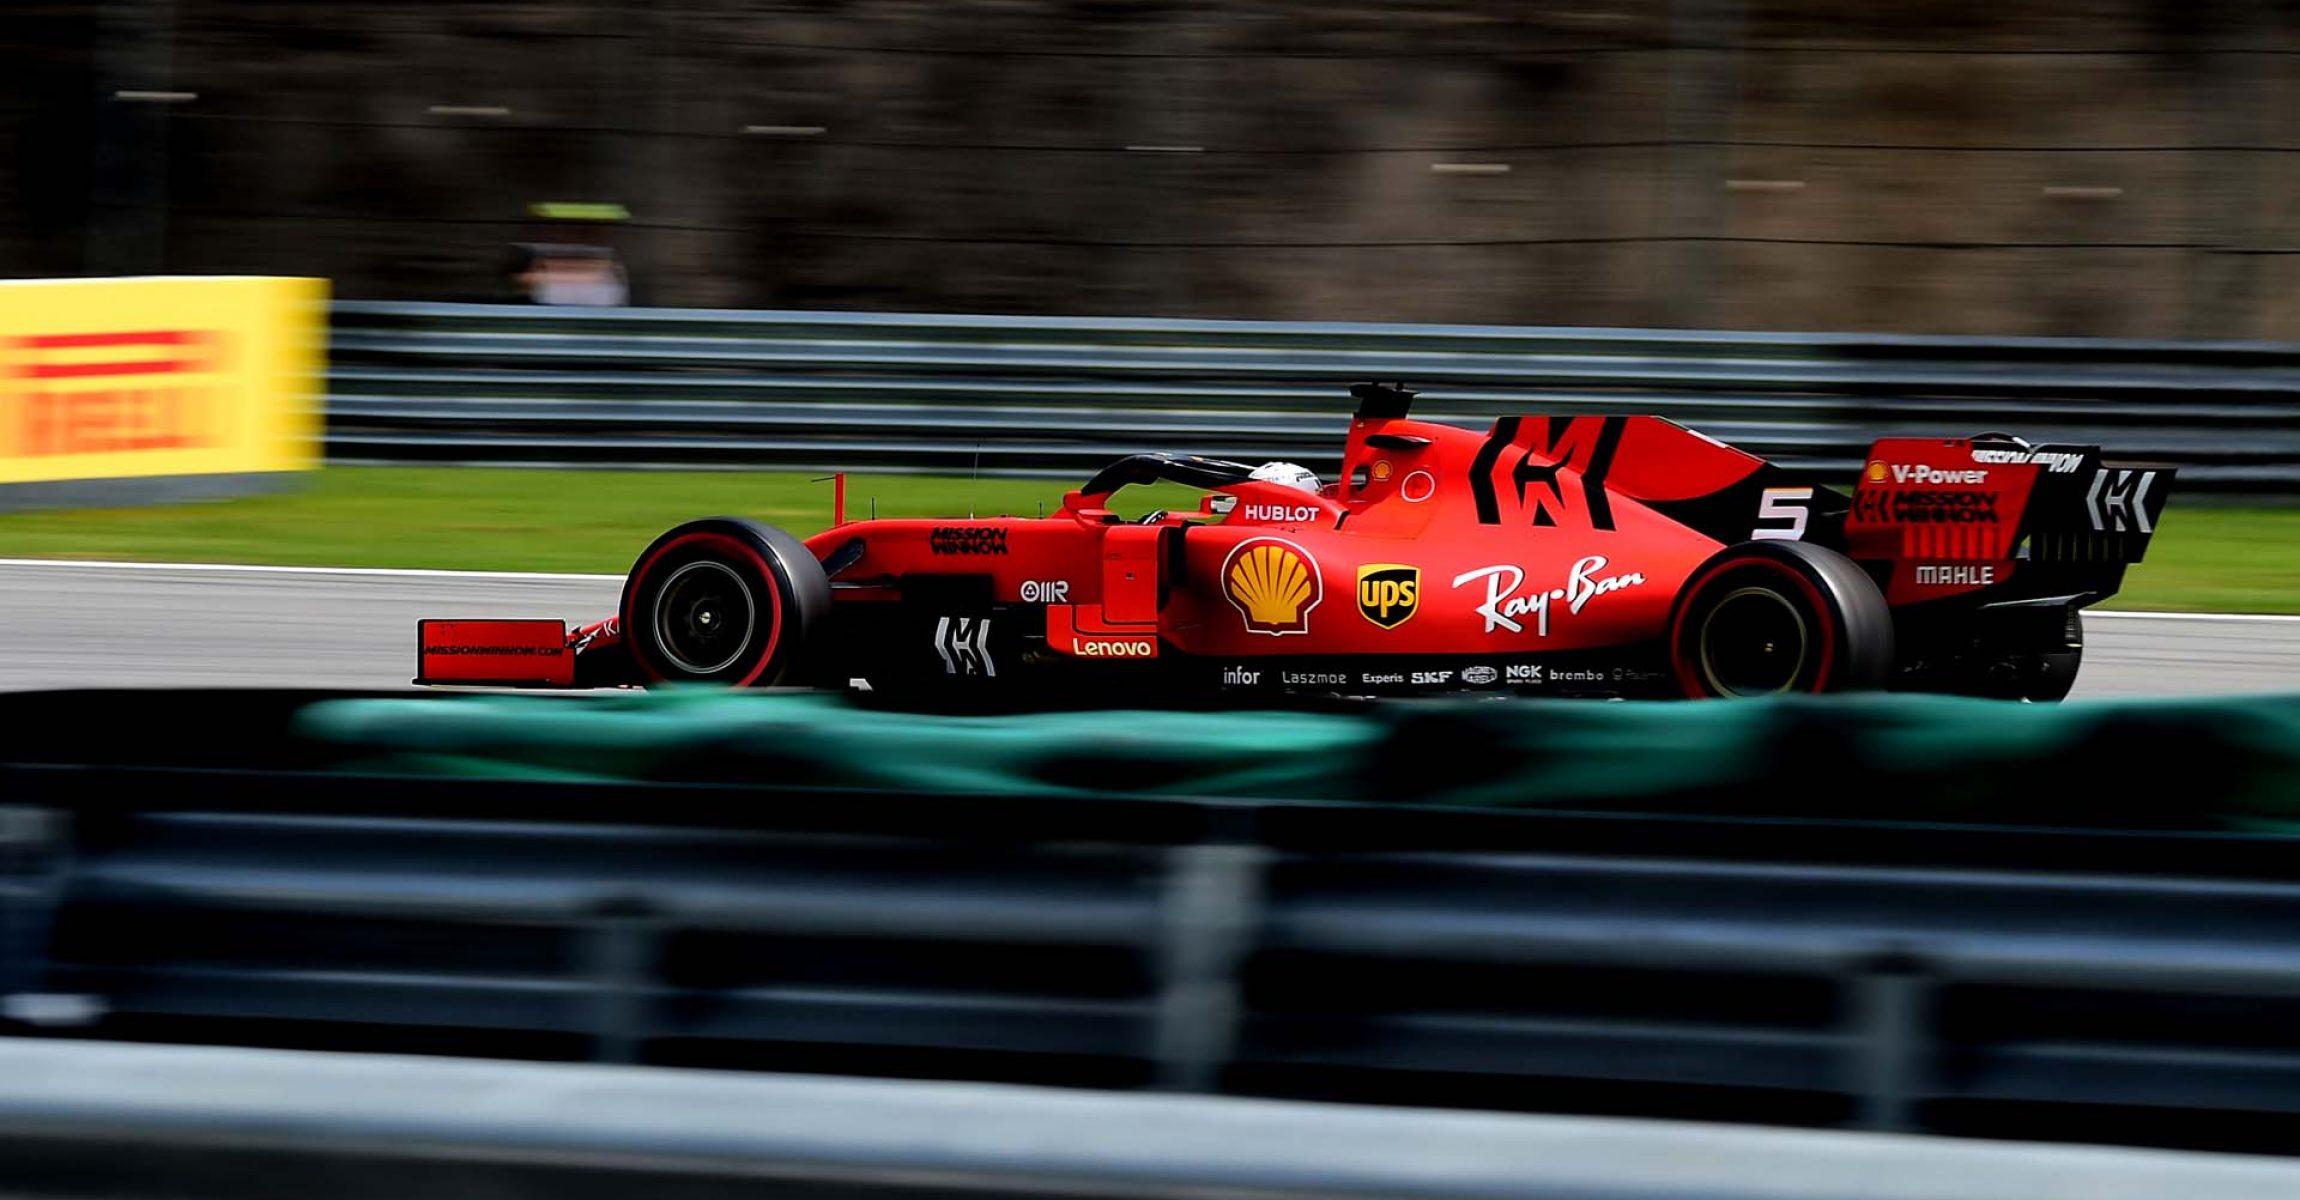 GP BRASILE F1/2019 - DOMENICA 17/11/2019 credit: @Scuderia Ferrari Press Office Sebastian Vettel Ferrari